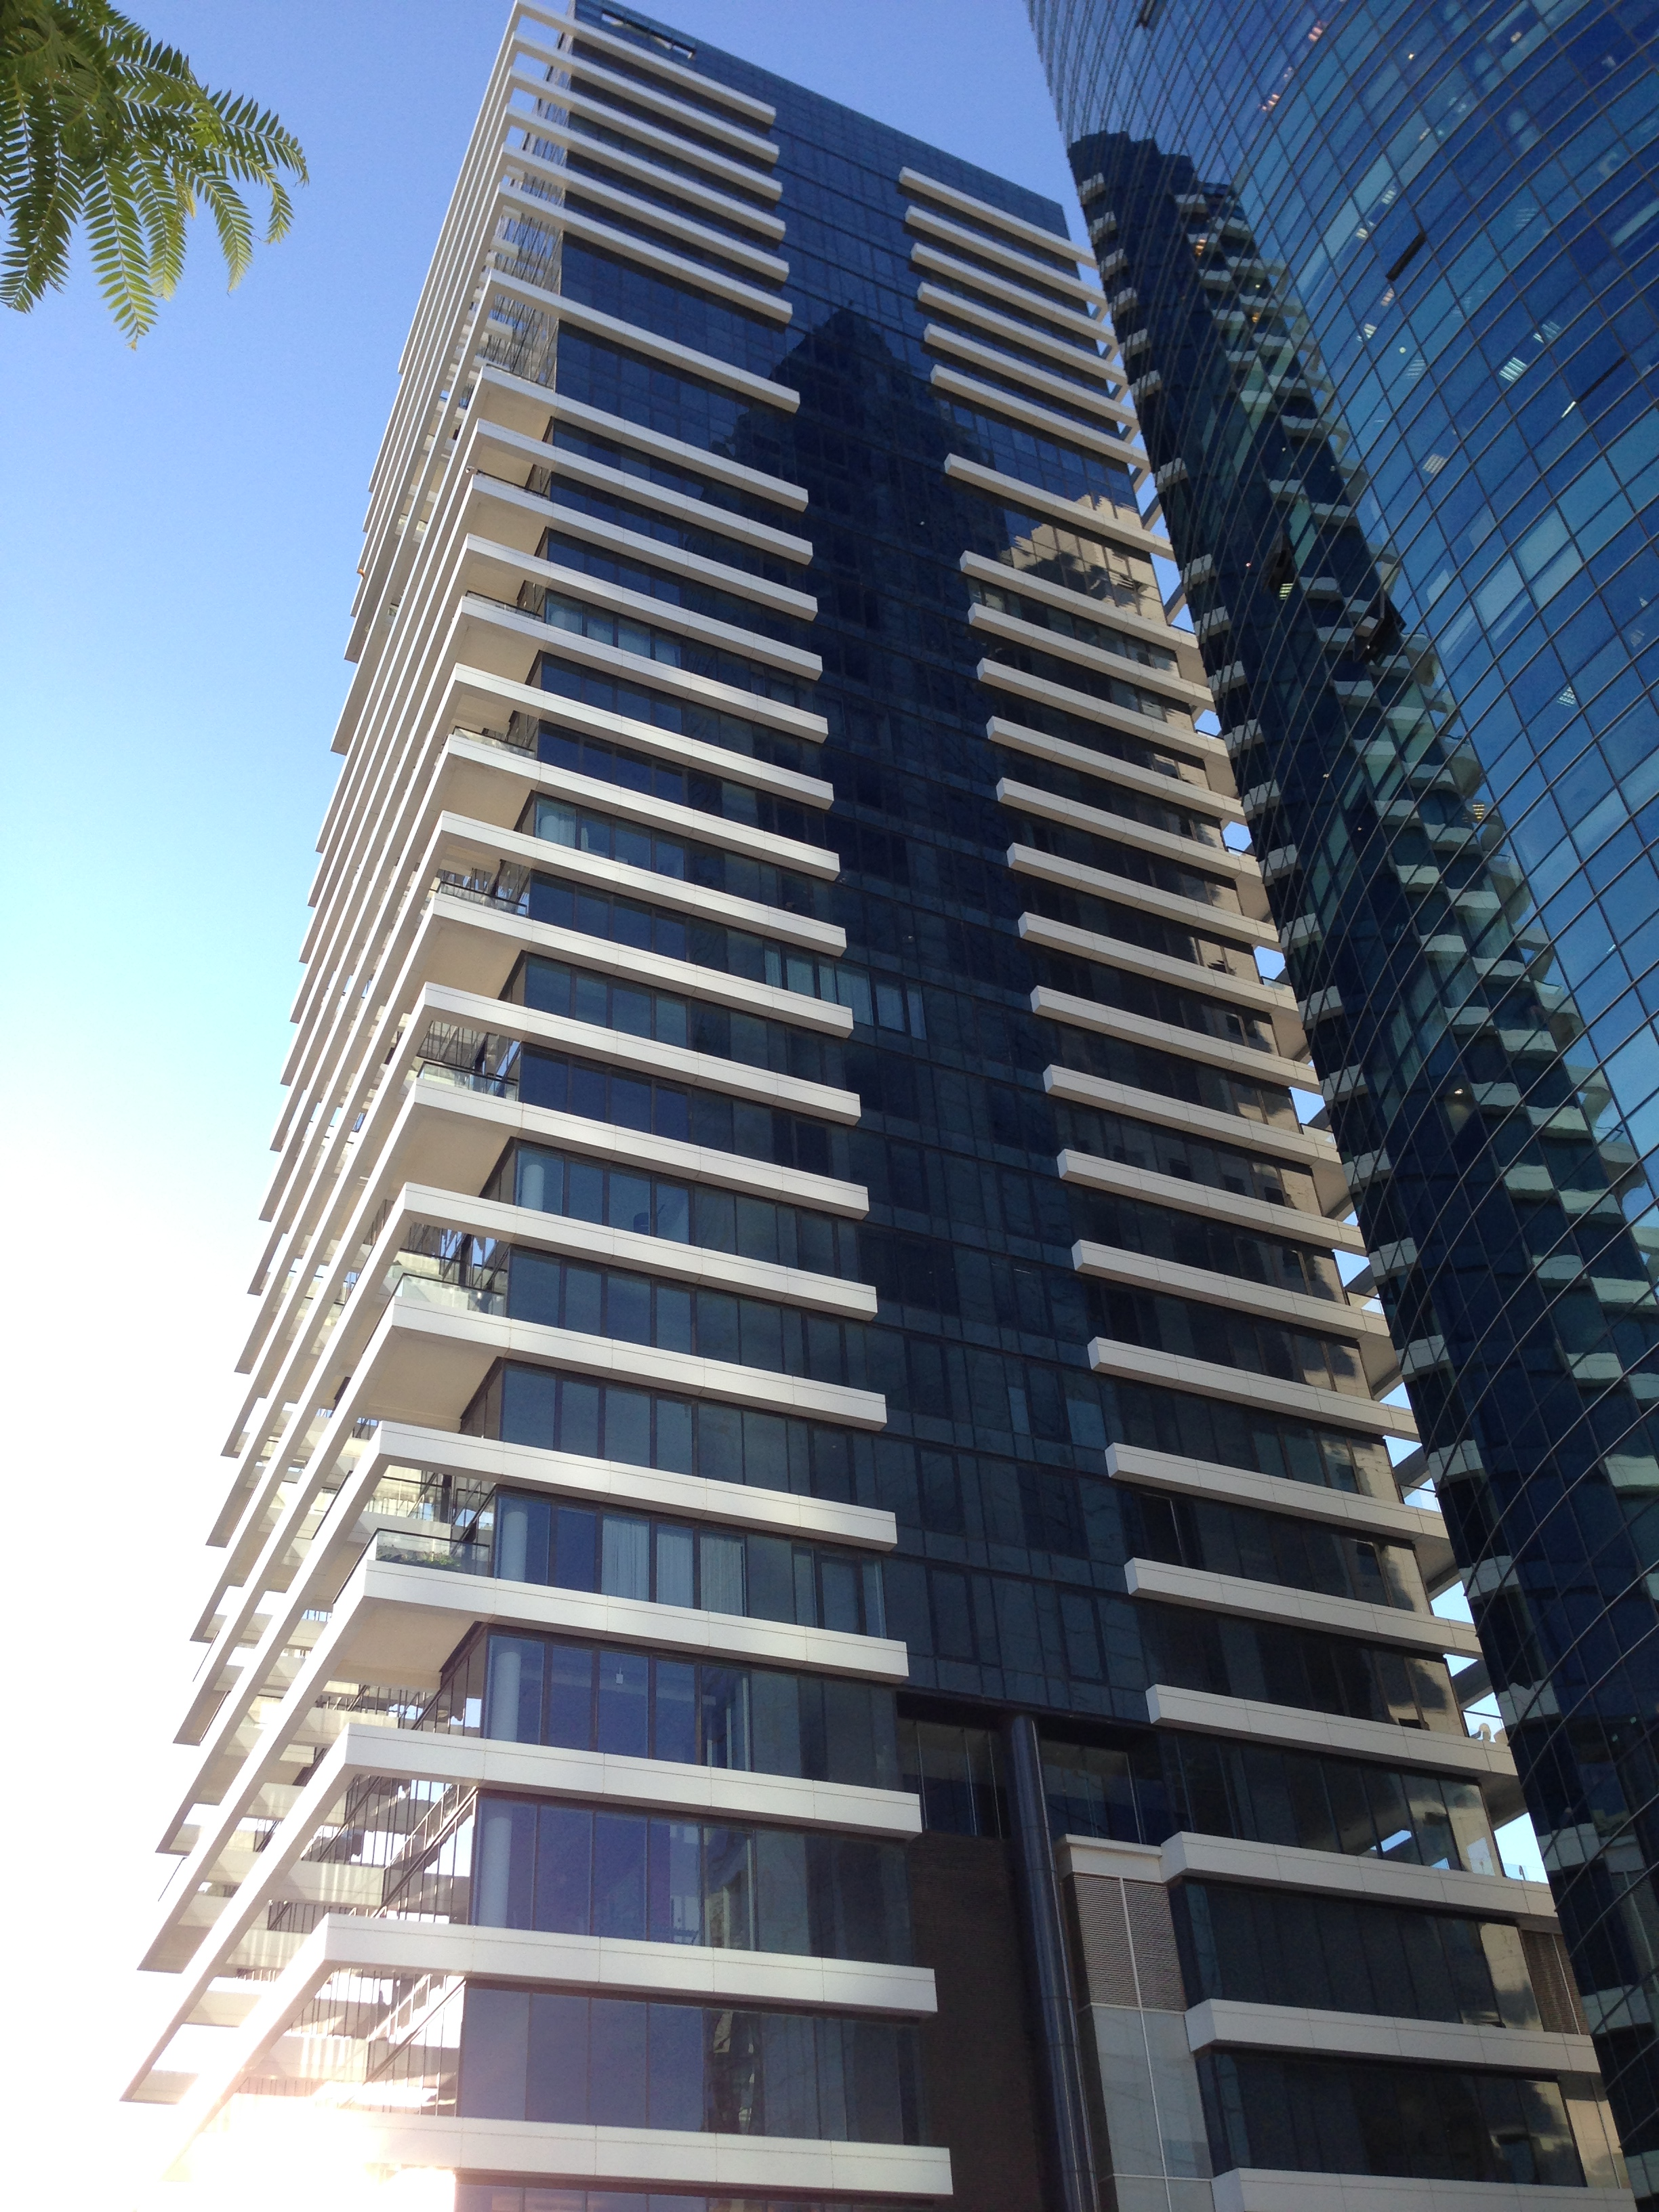 Despite its New Neighbors, Rothschild 1 Still Reigns as Tel Aviv's Top Building